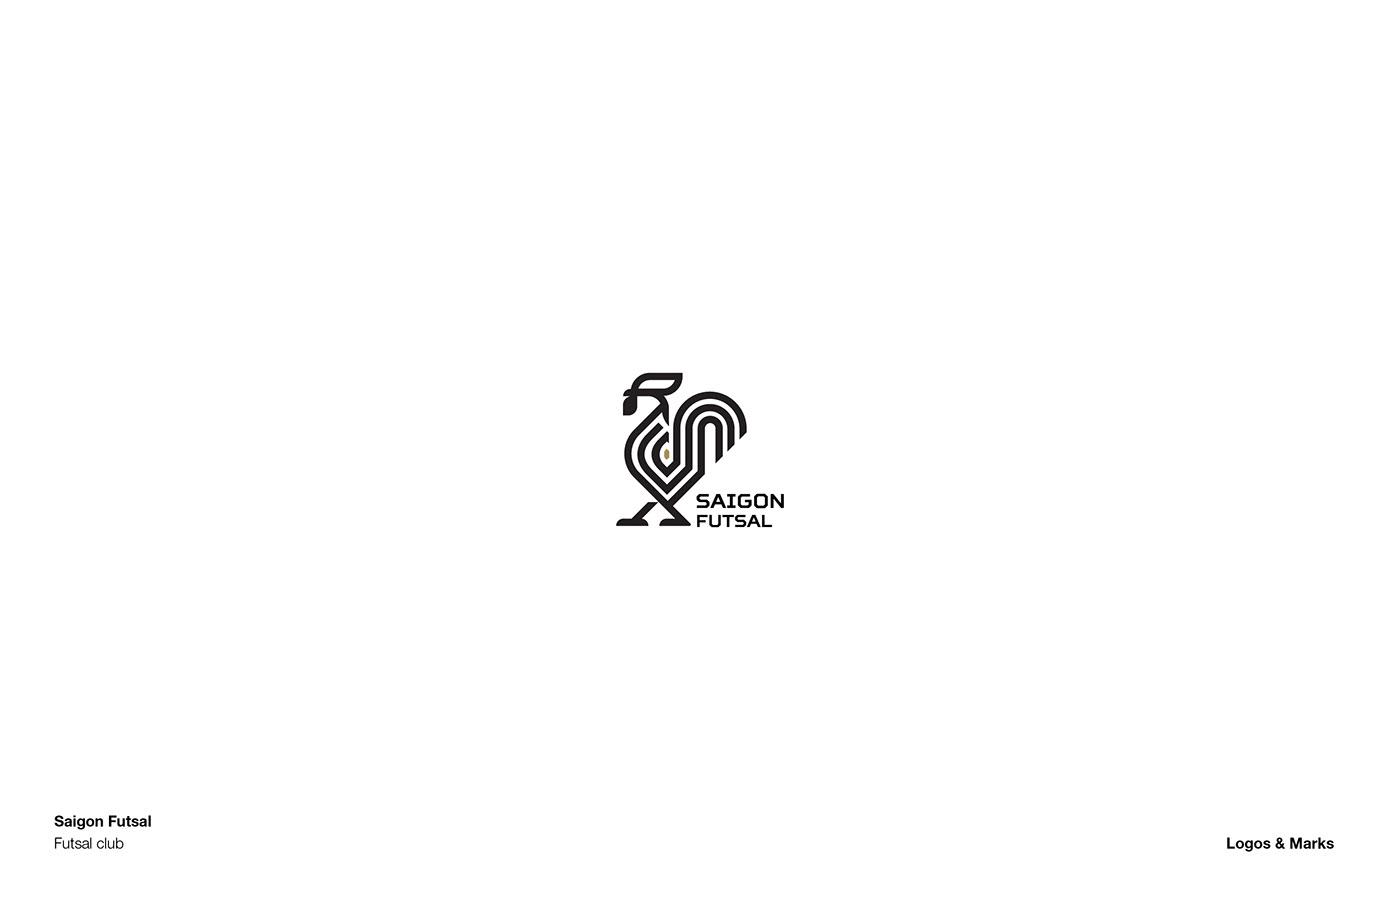 logofolio logomarks logos&Marks vuphamdesign logotypes logo mondaystudio